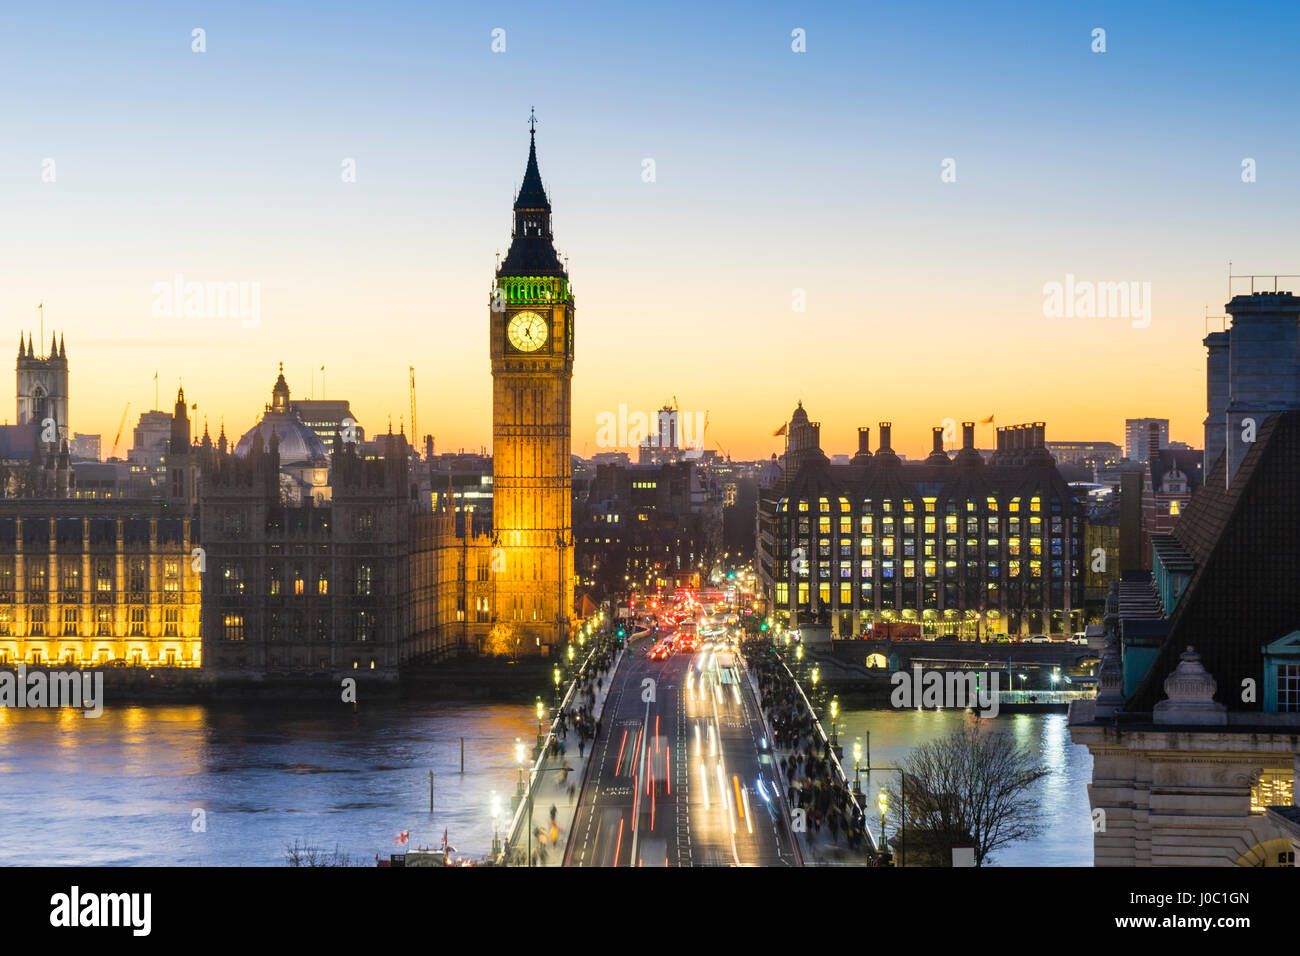 Vogelperspektive Blick auf Big Ben, der Palace of Westminster und Westminster Bridge bei Dämmerung, London, Stockbild